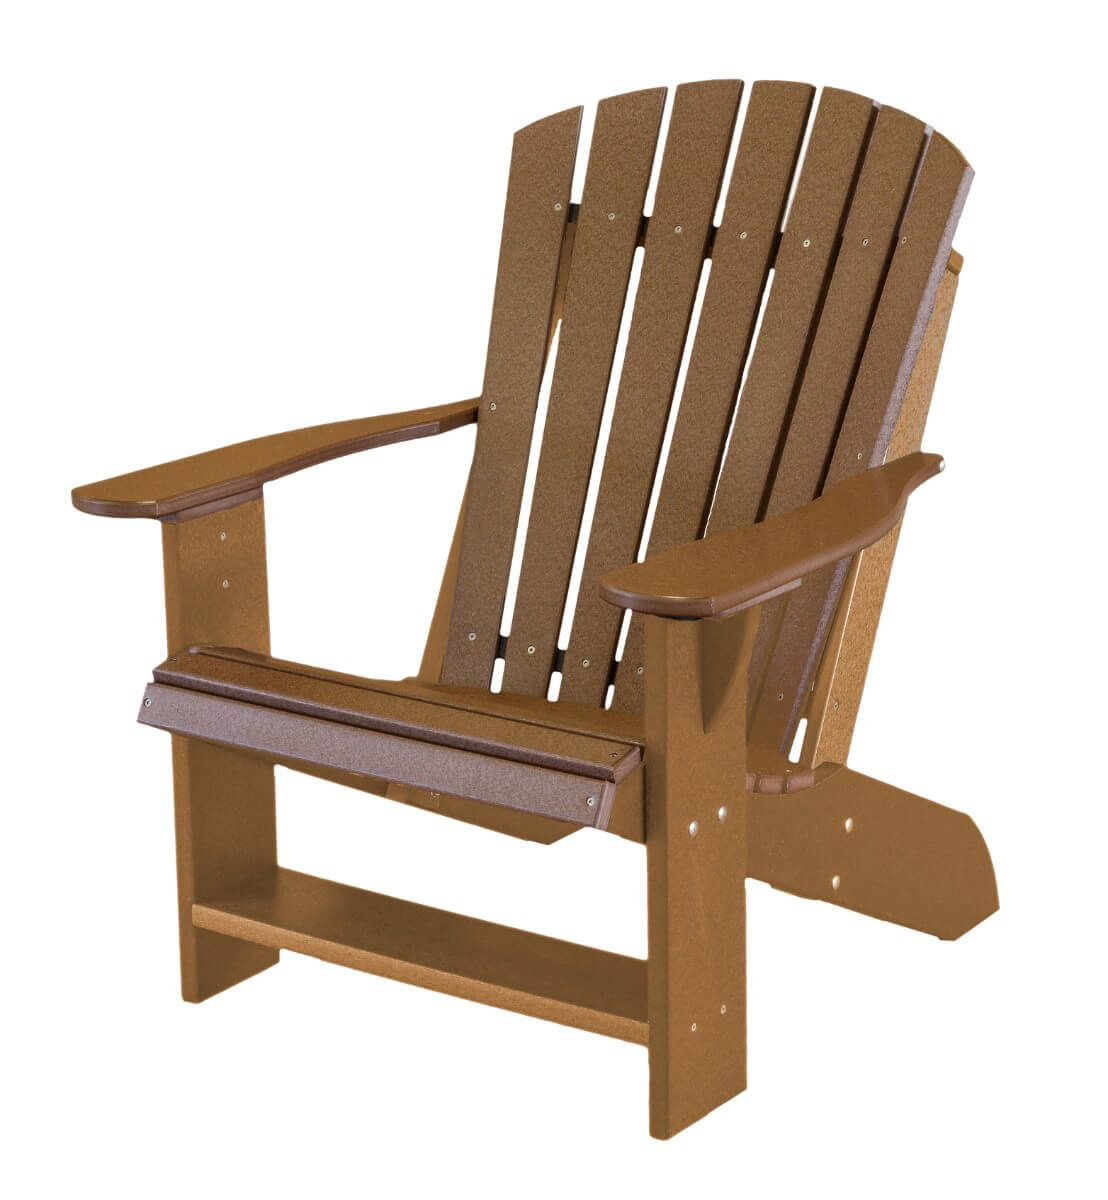 Tudor Brown Sidra Adirondack Chair